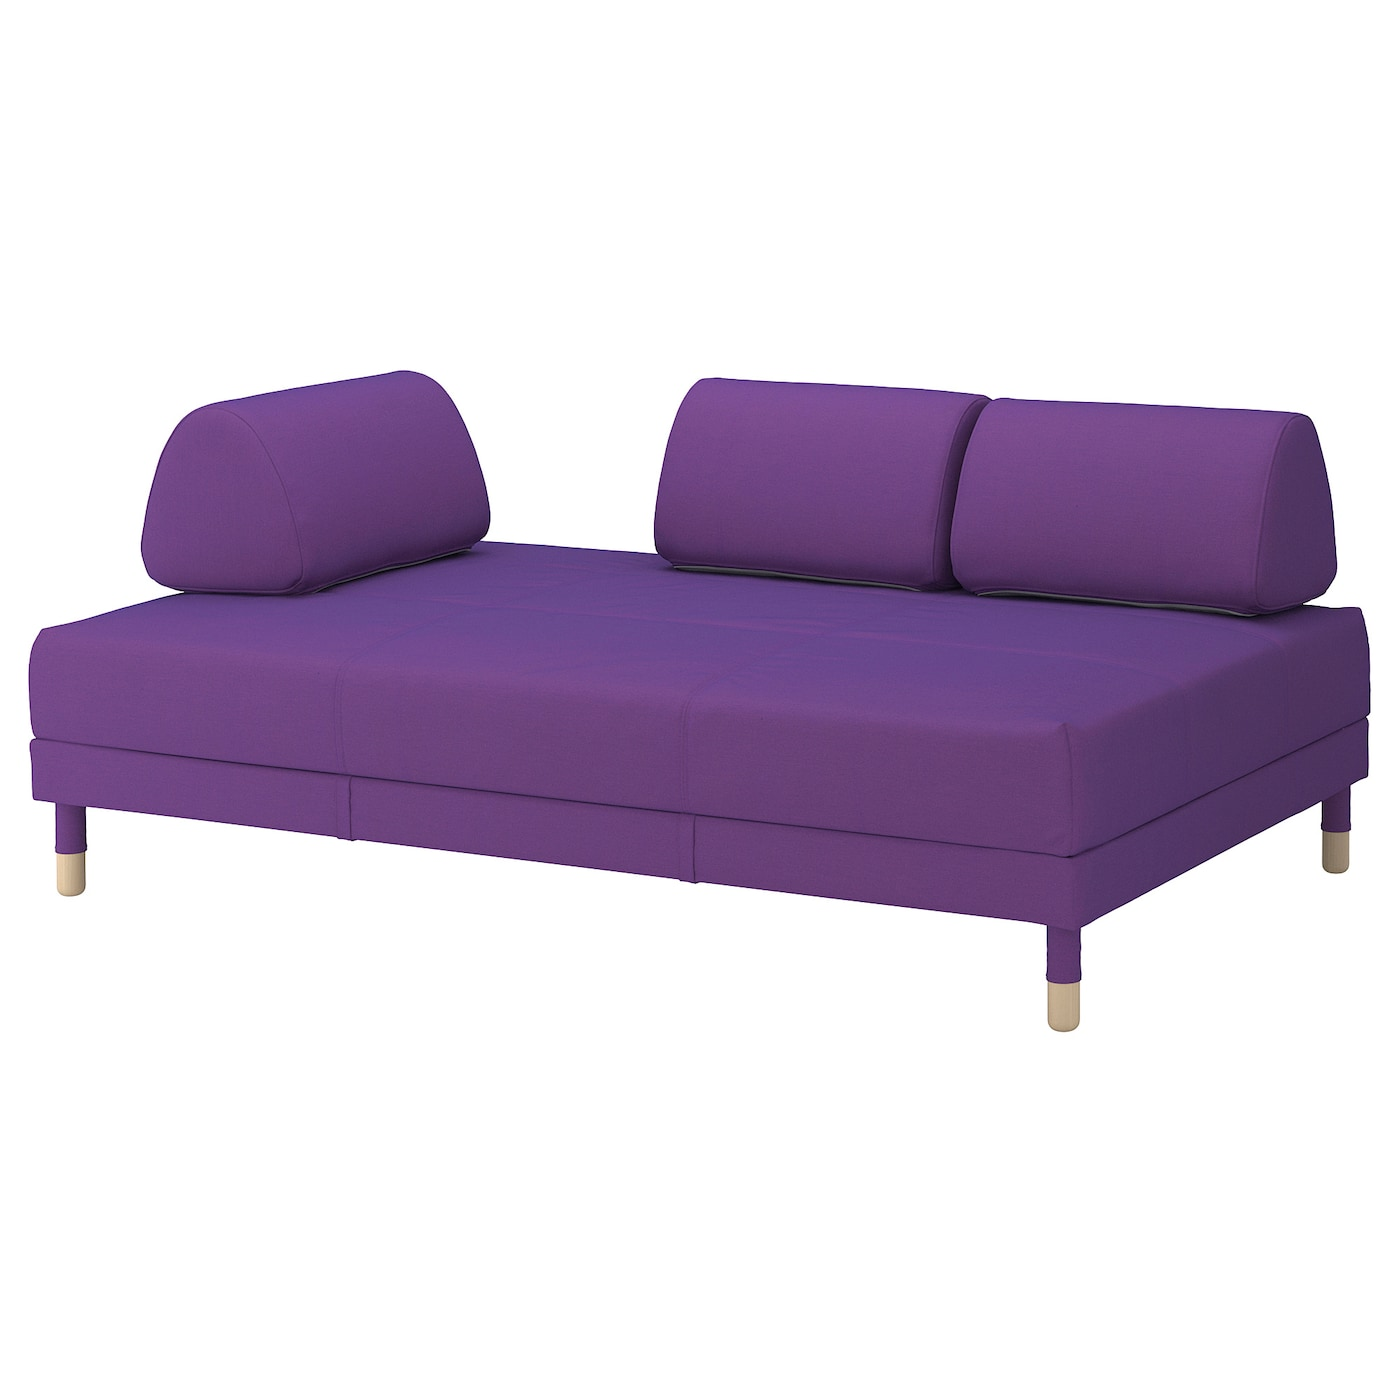 Flottebo Vissle Purple Sofa Bed 120